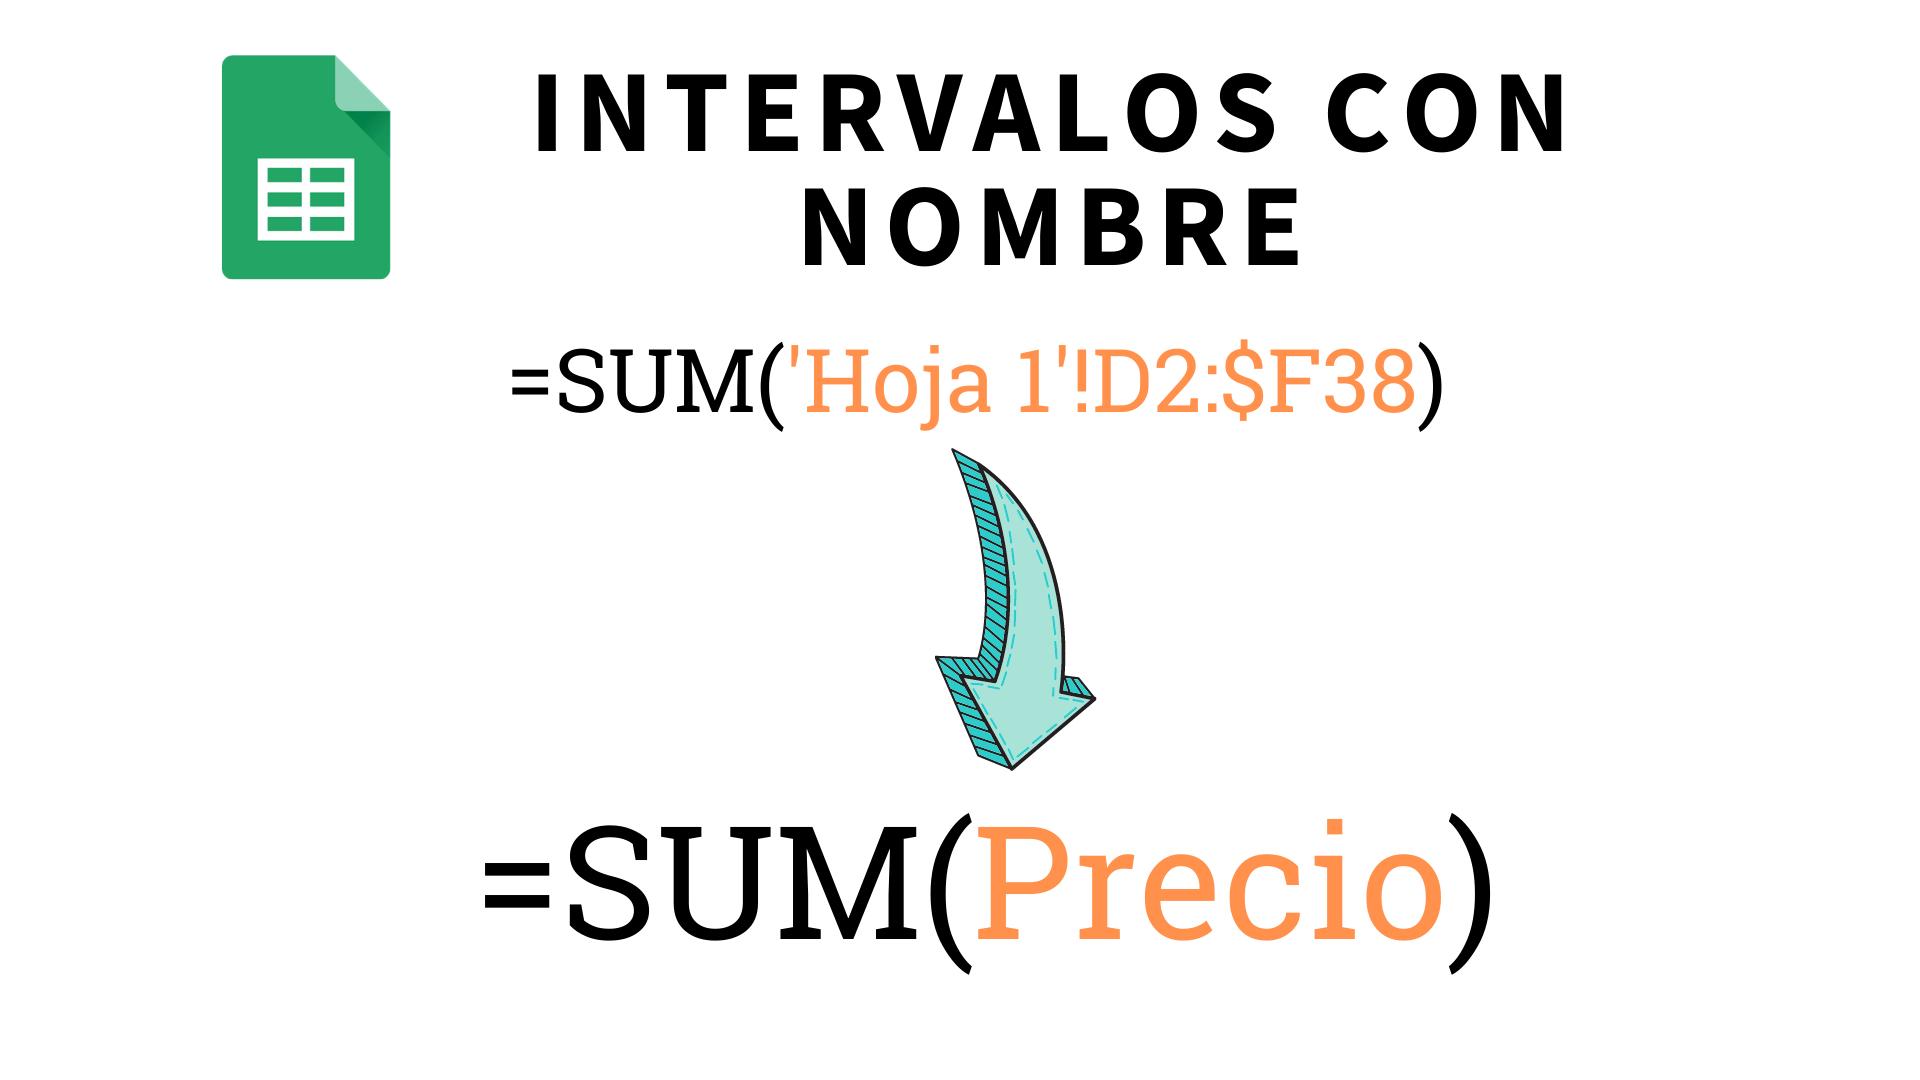 Usar intervalos con nombre en Google Sheets (Hojas de Cálculo de Google)